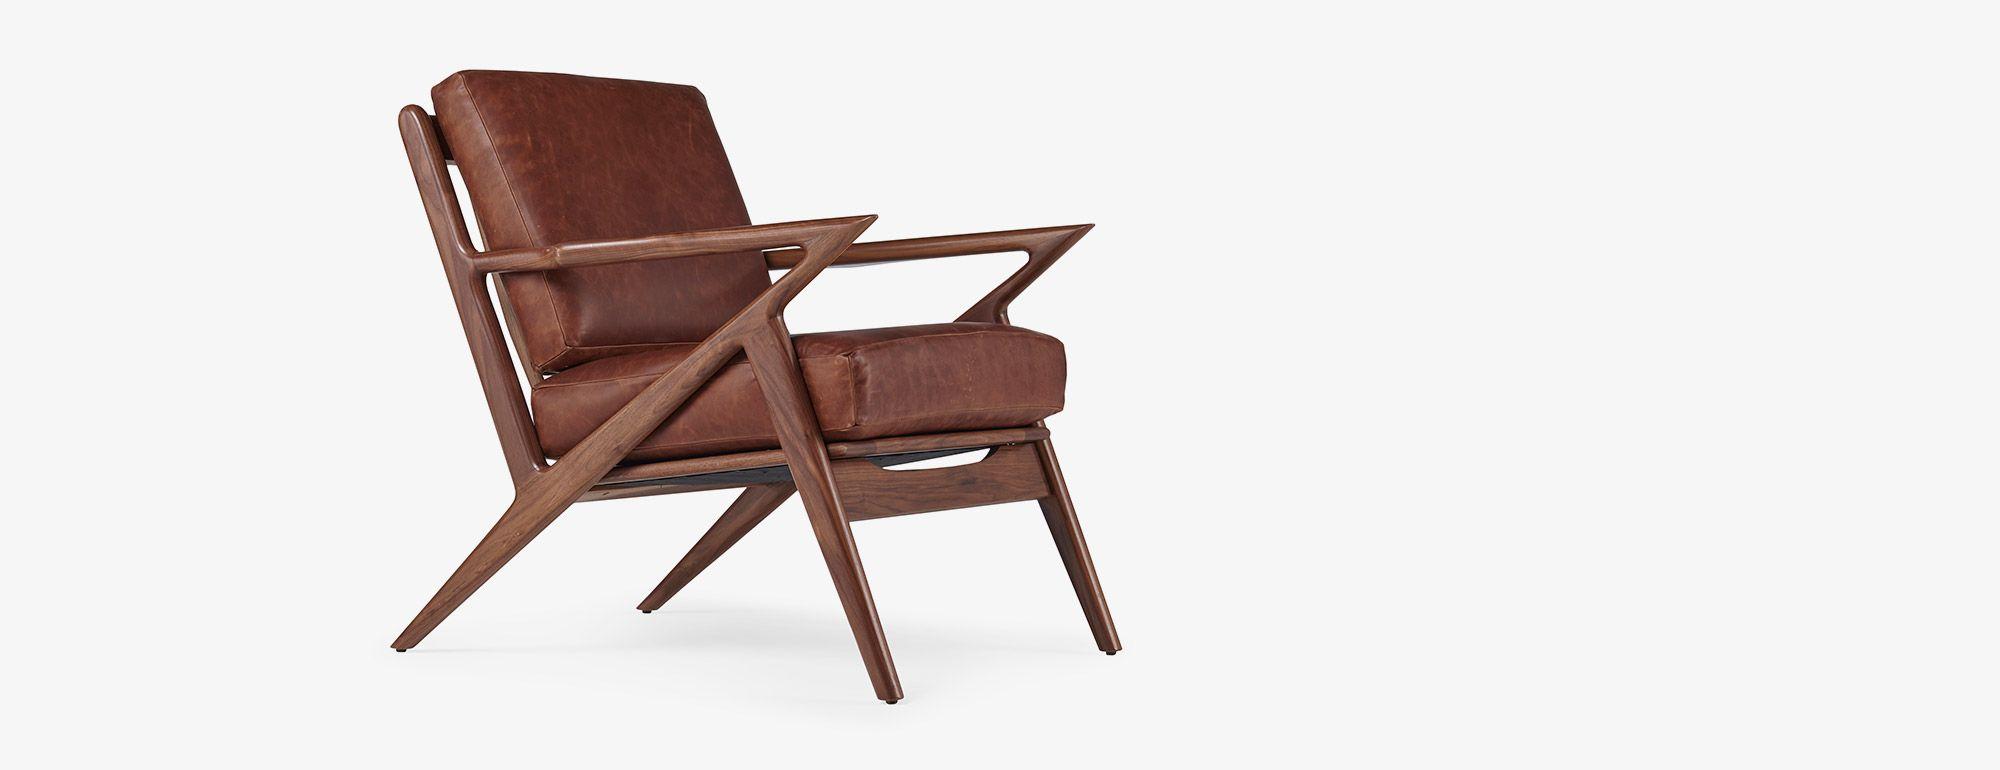 Pleasing Soto Leather Chair Escape Home Chair Pedicure Chairs Inzonedesignstudio Interior Chair Design Inzonedesignstudiocom